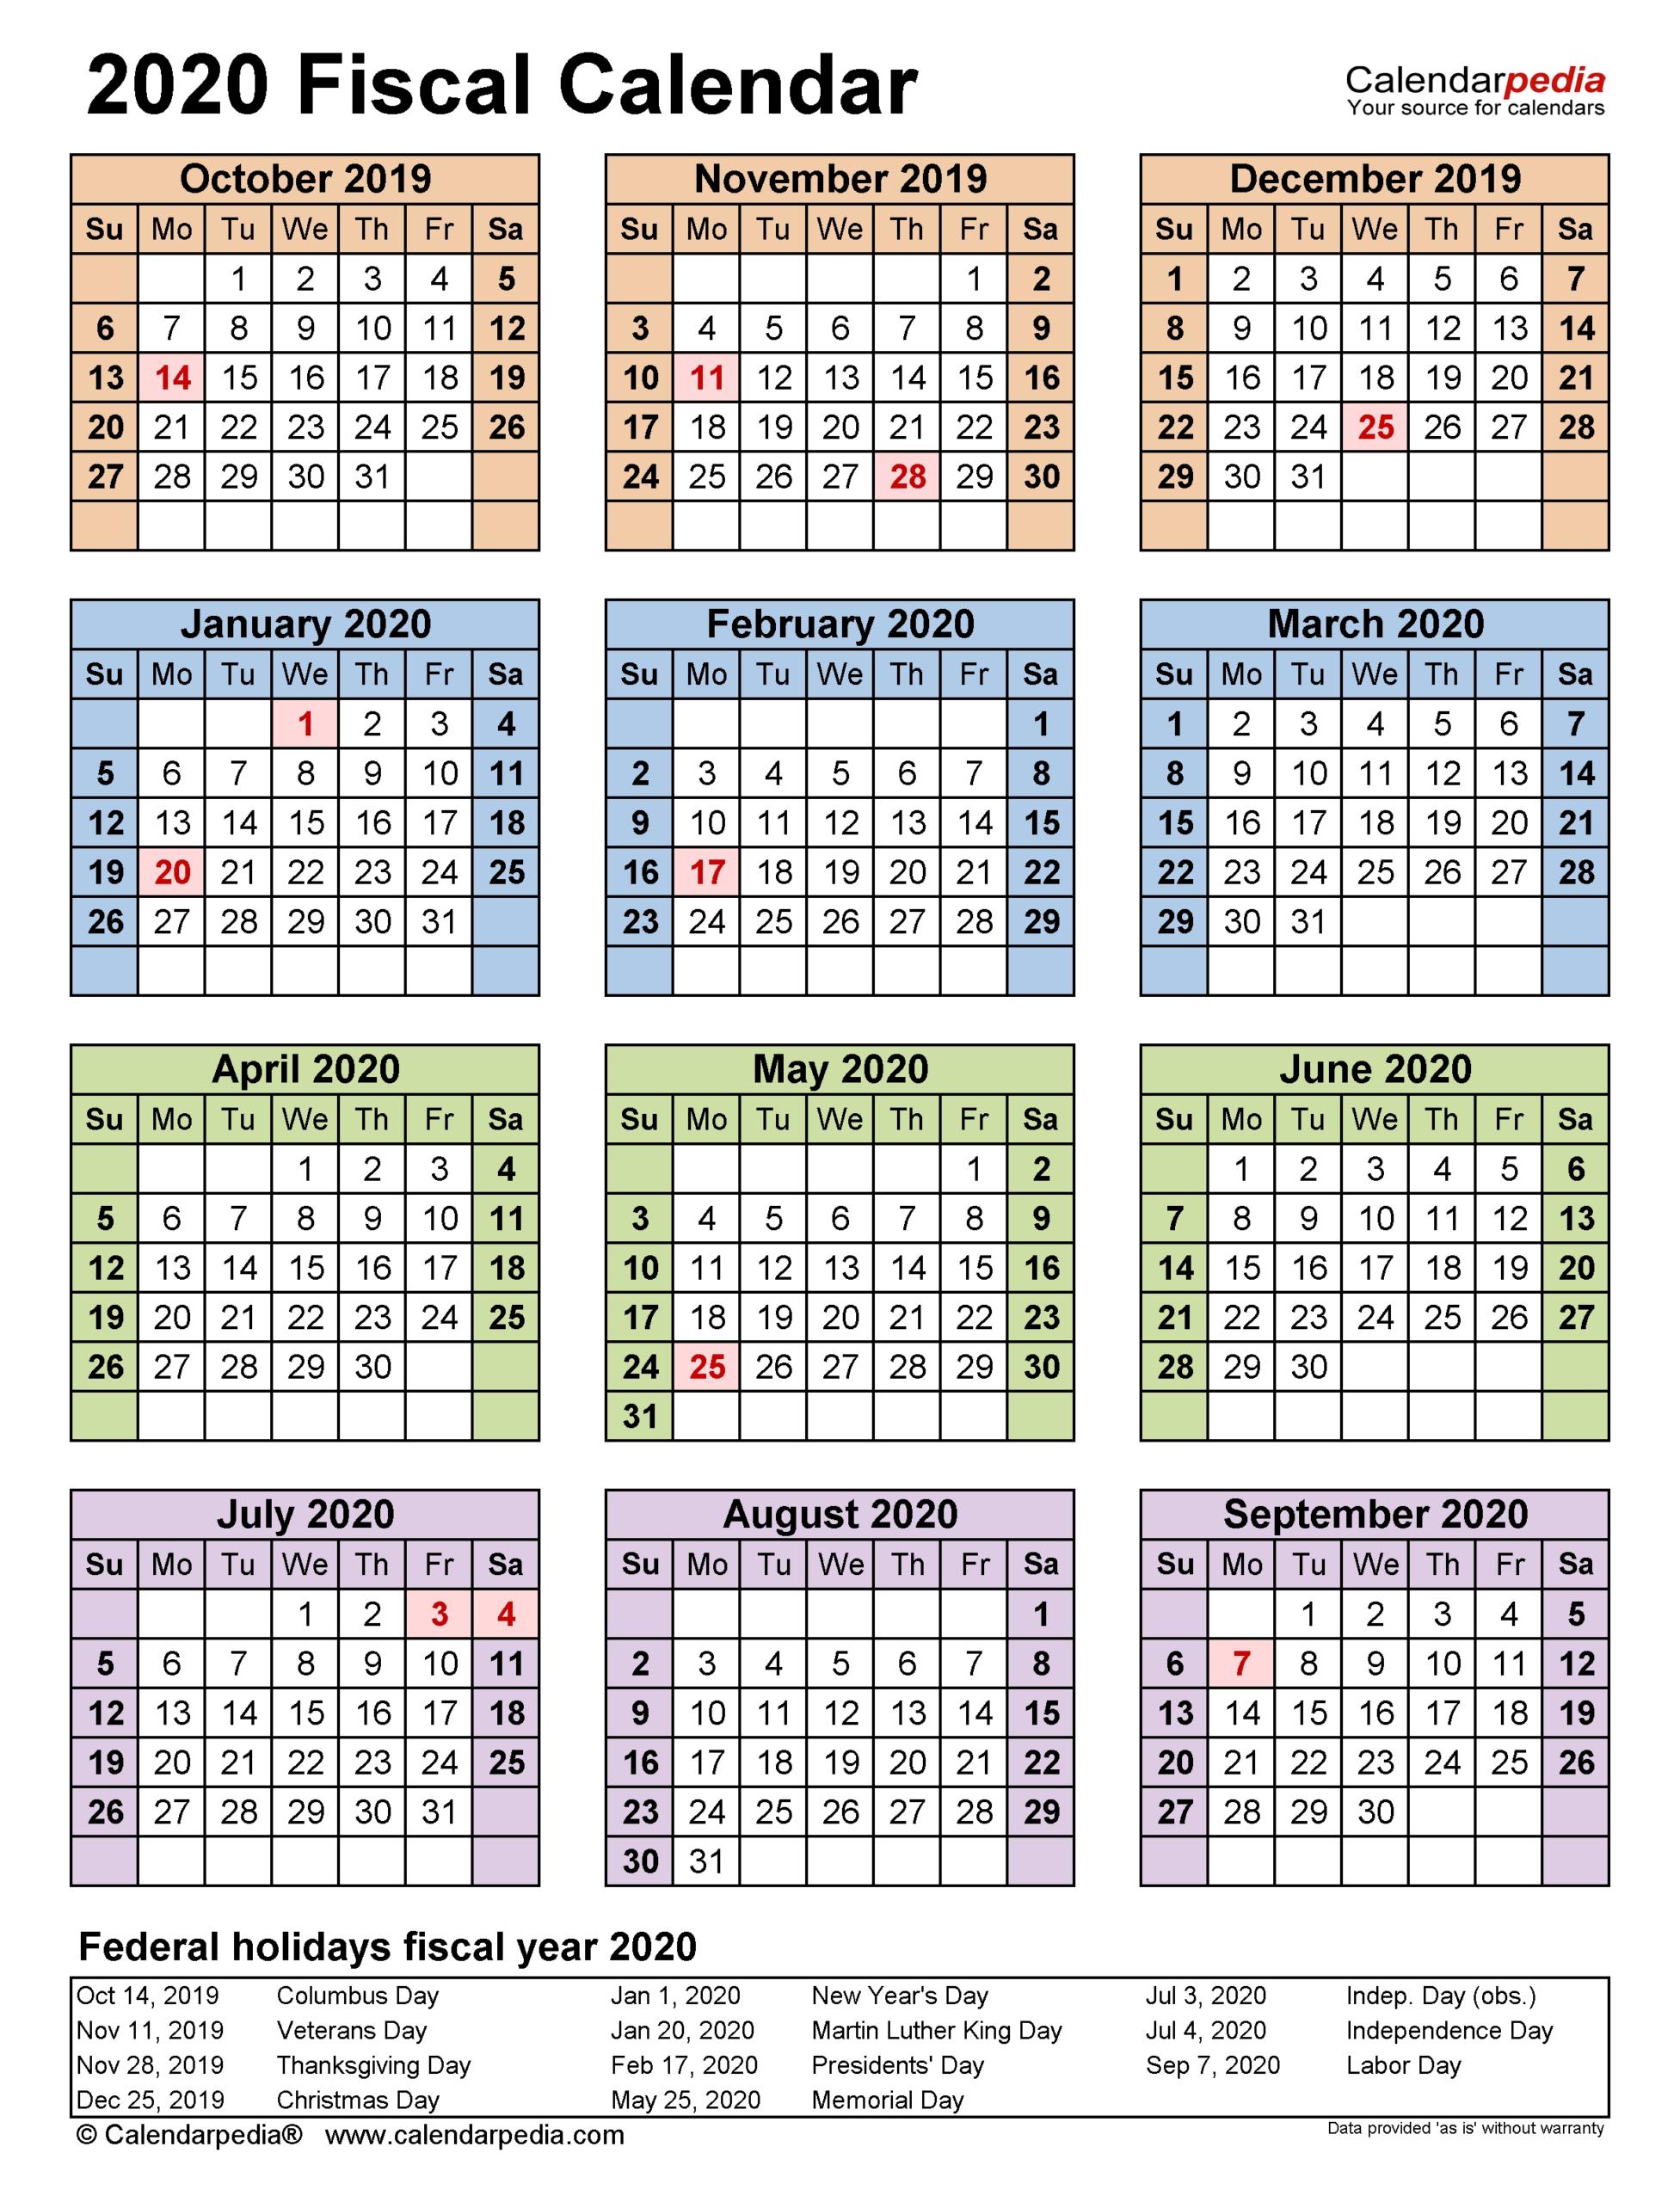 Calendar 4 4 5 Template   Free Calendar Template Example with regard to Retsil 4 5 4 Cakander